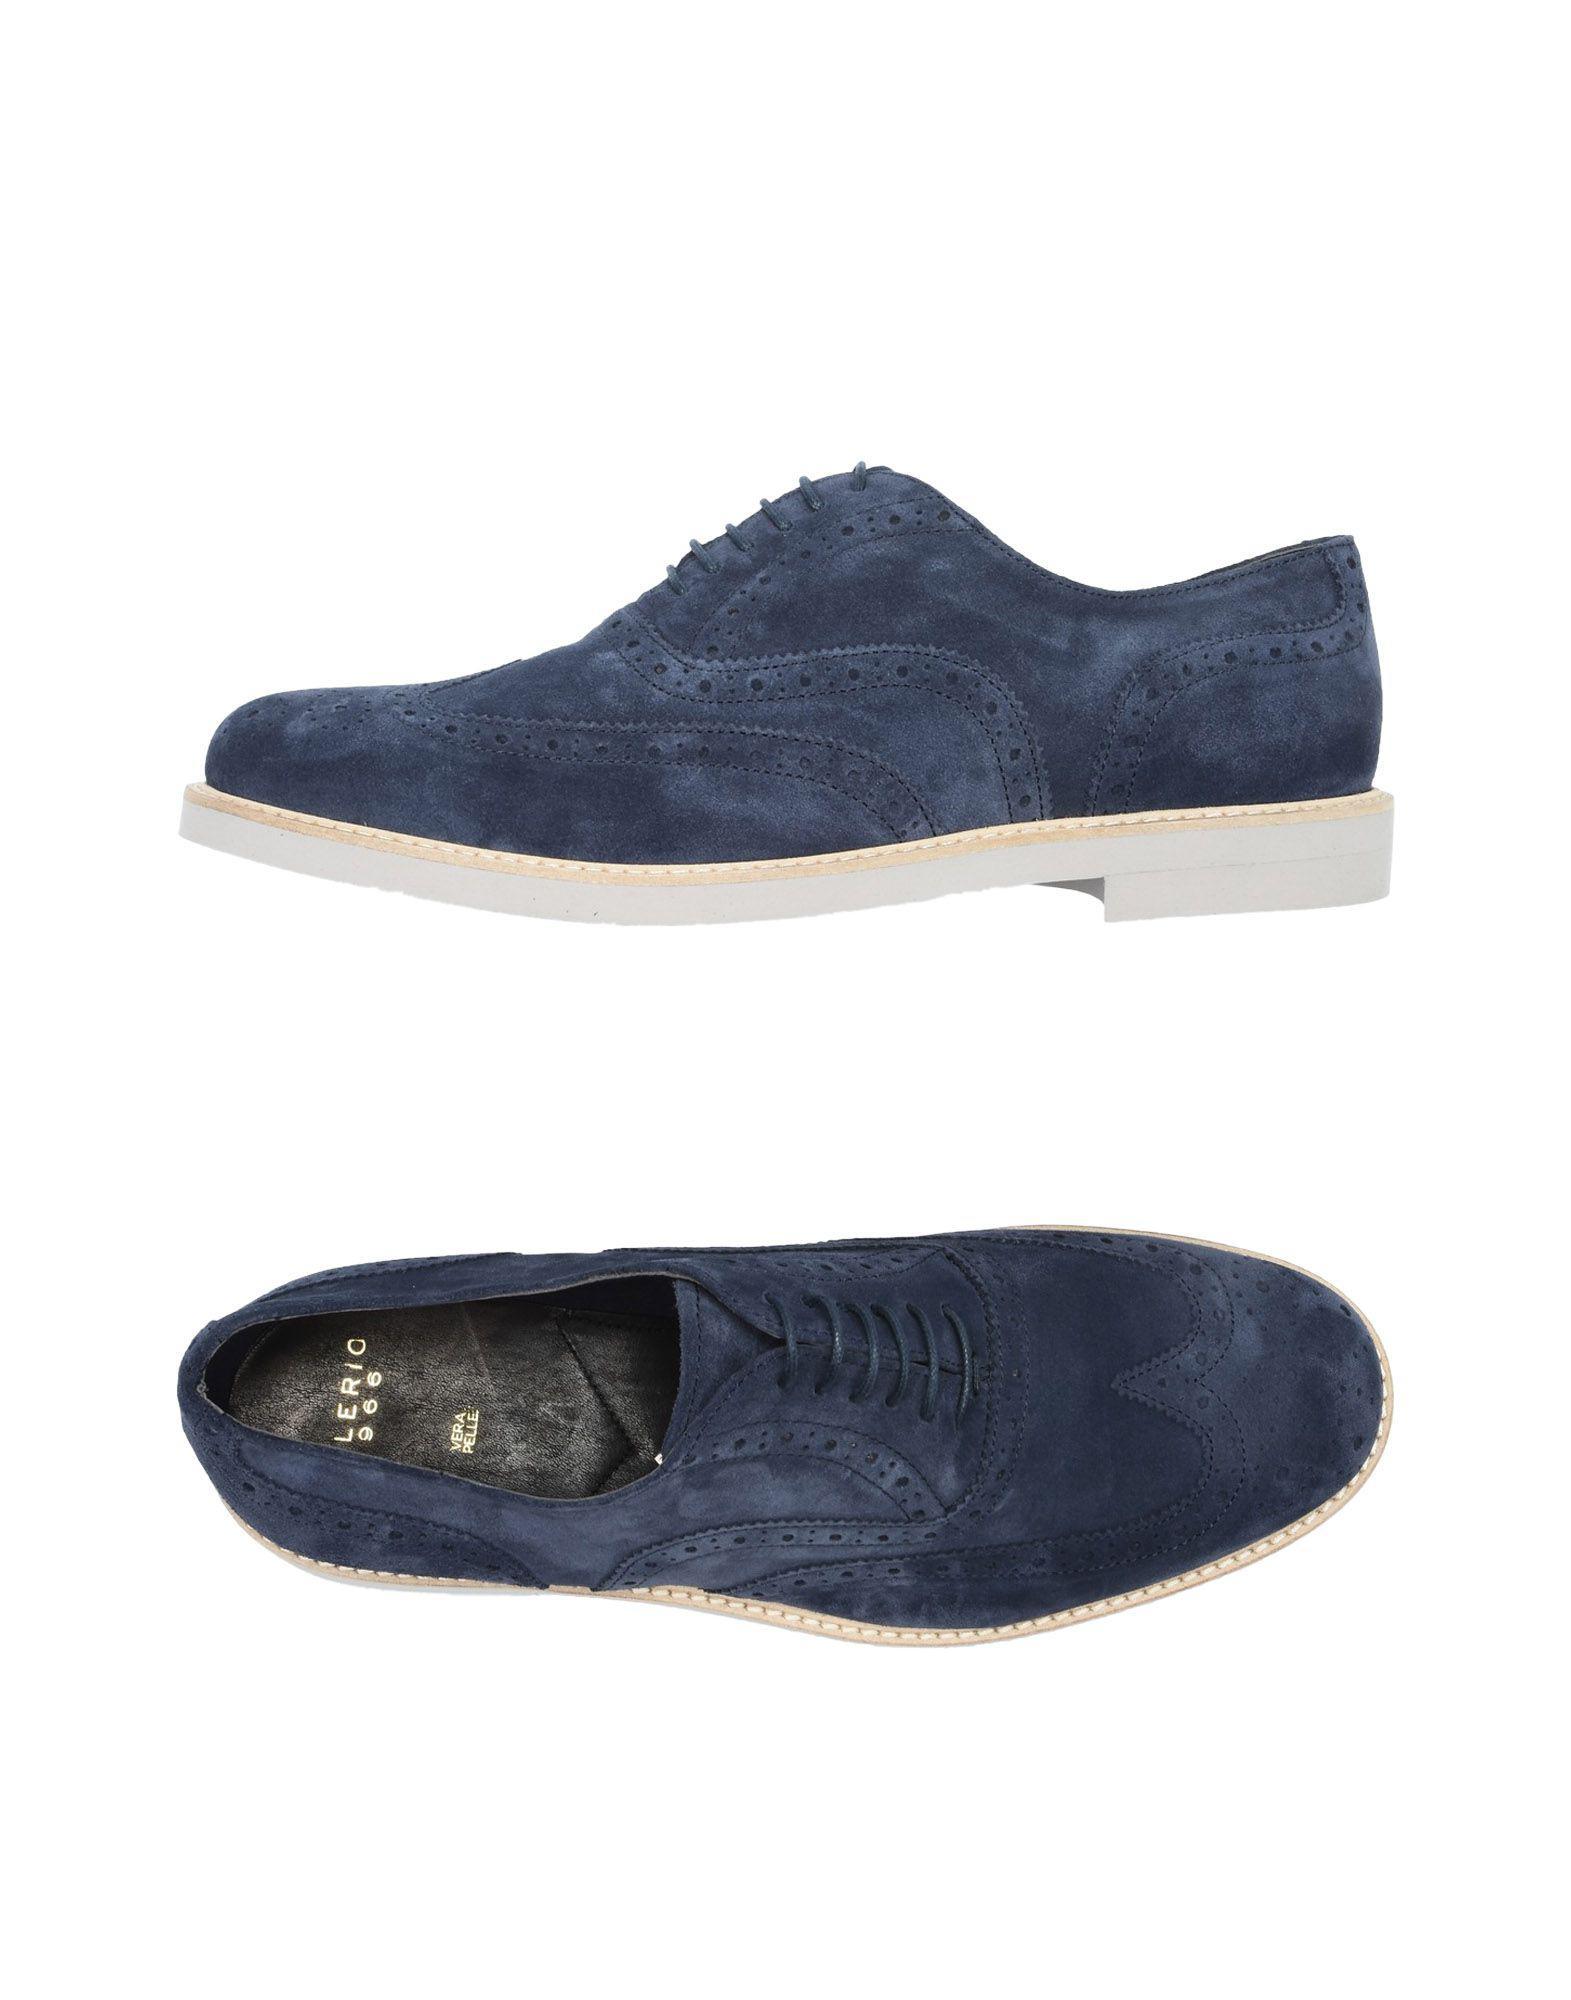 FOOTWEAR - Lace-up shoes Valerio 1966 H5rbfJl7